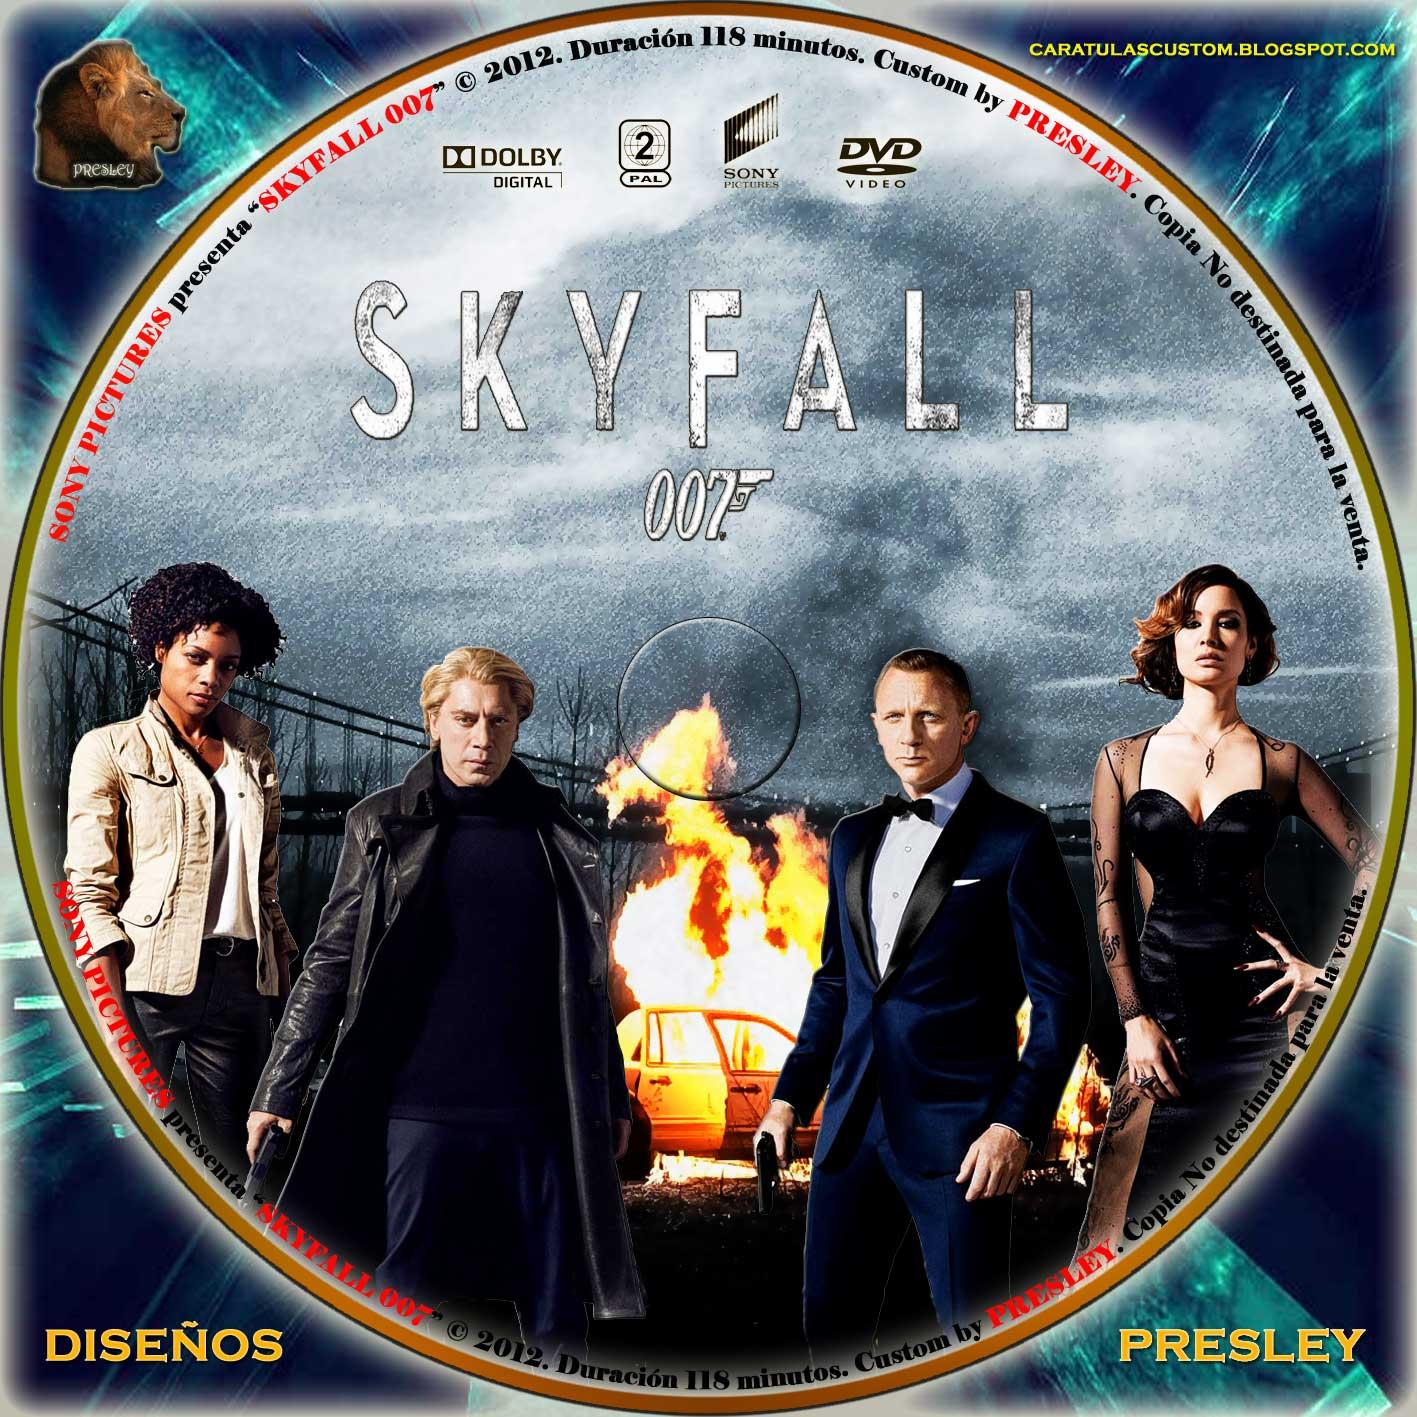 Skyfall - wikipe...007 Skyfall Dvd Cover